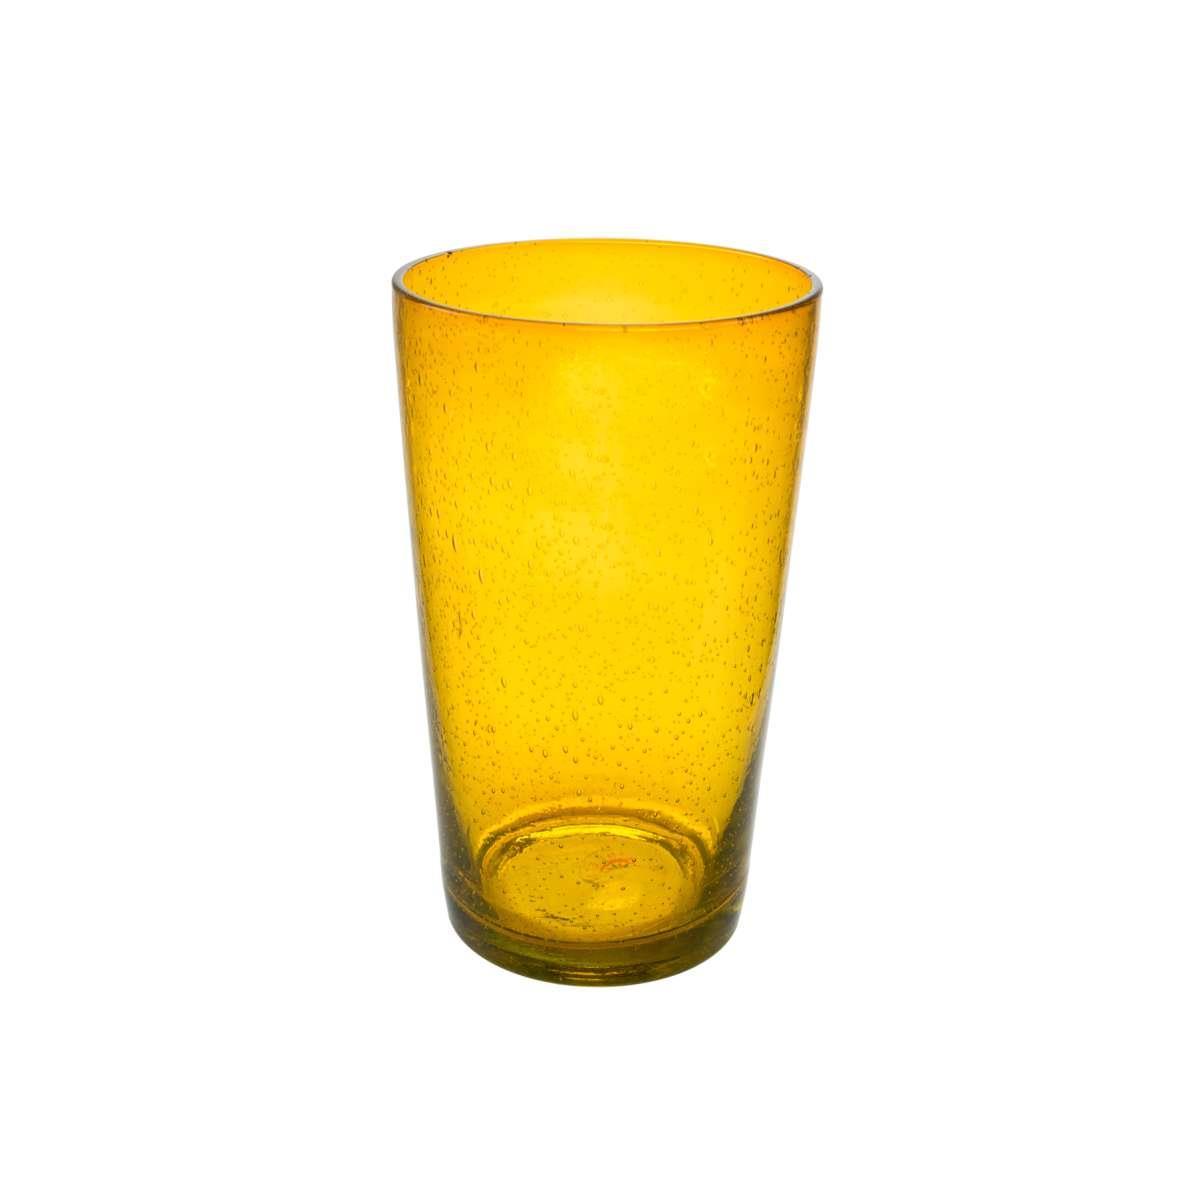 S/6 Ποτήρι νερού φυσητό Sunset γυάλινο μελί 480ml